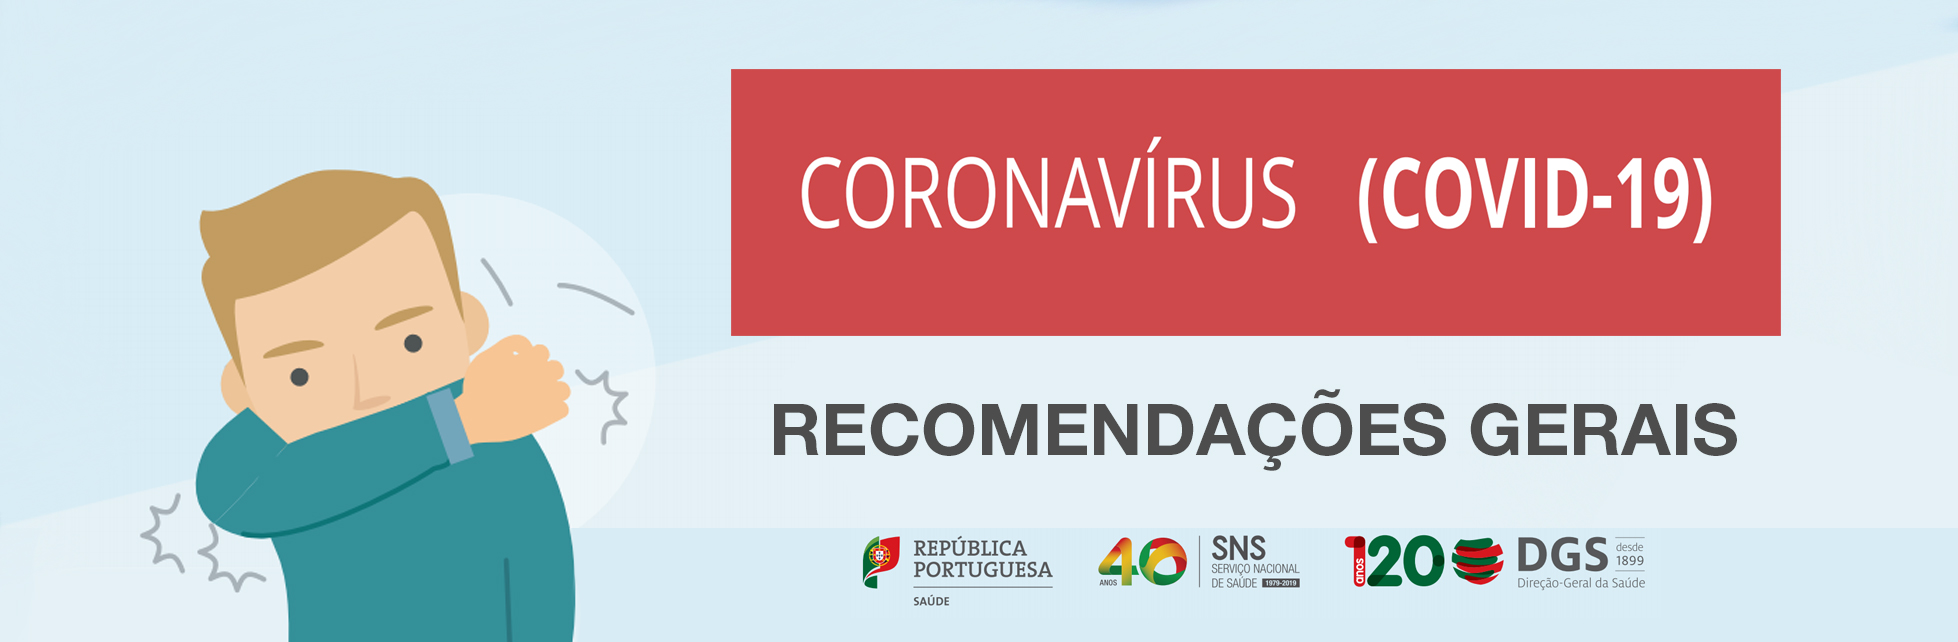 Coronavírus/COVID-19 Alerta e Recomendações